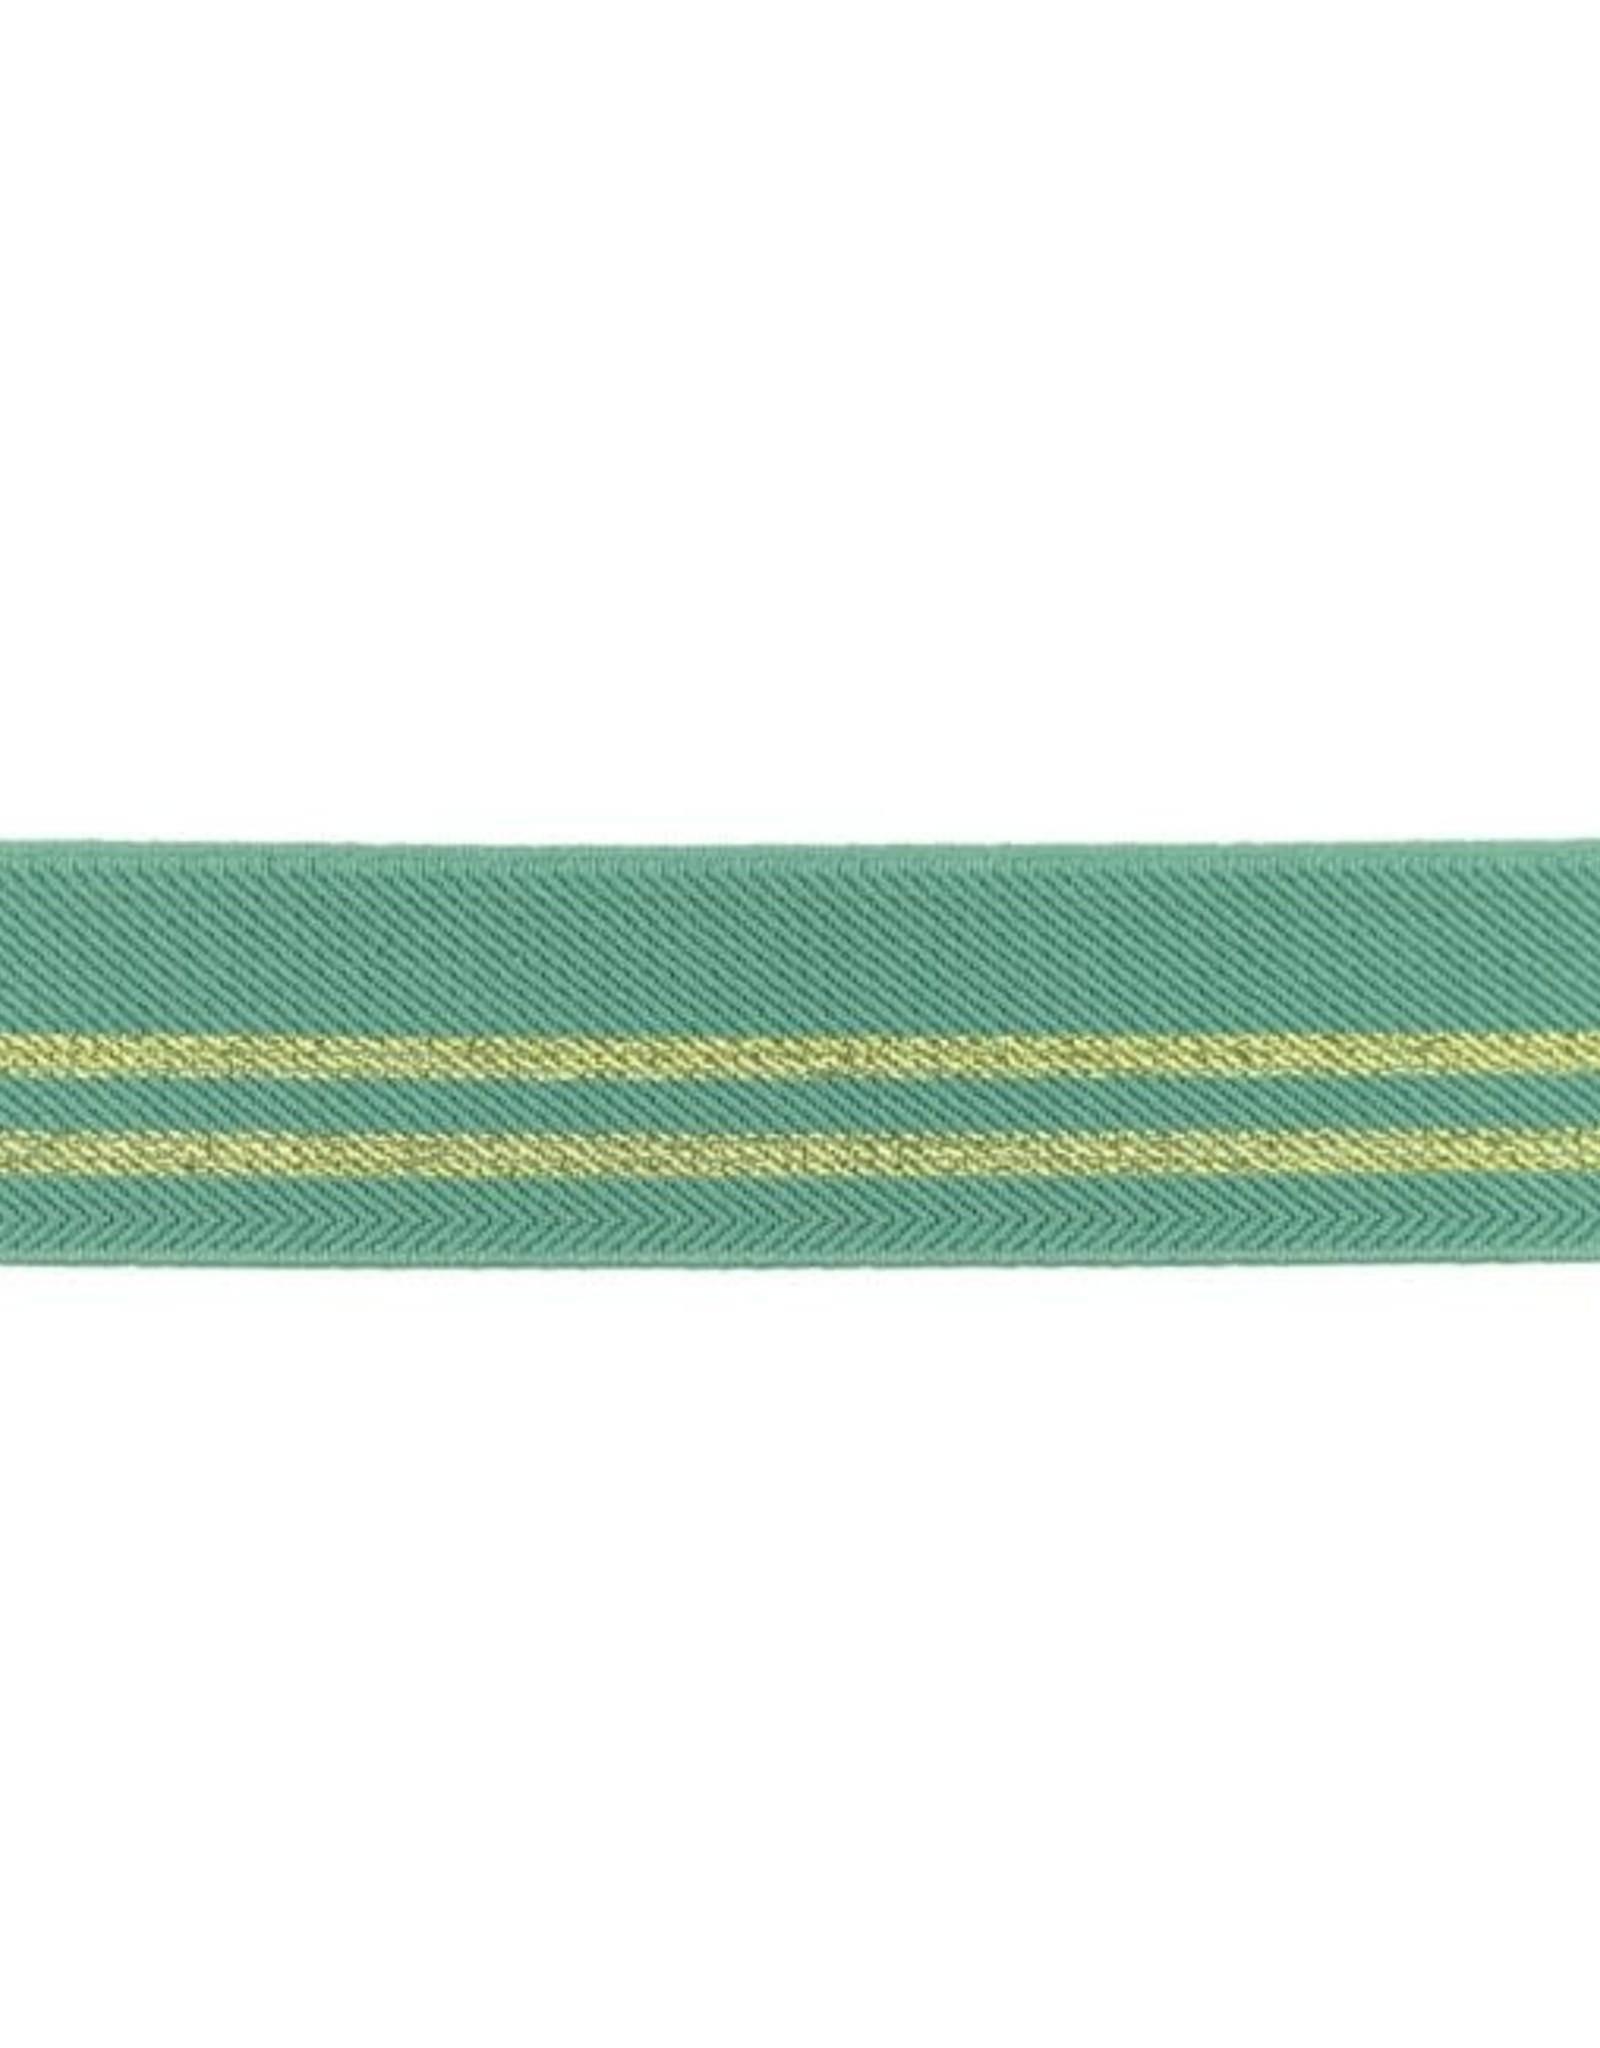 Gestreepte elastiek 30mm - Oudgroen/Goud